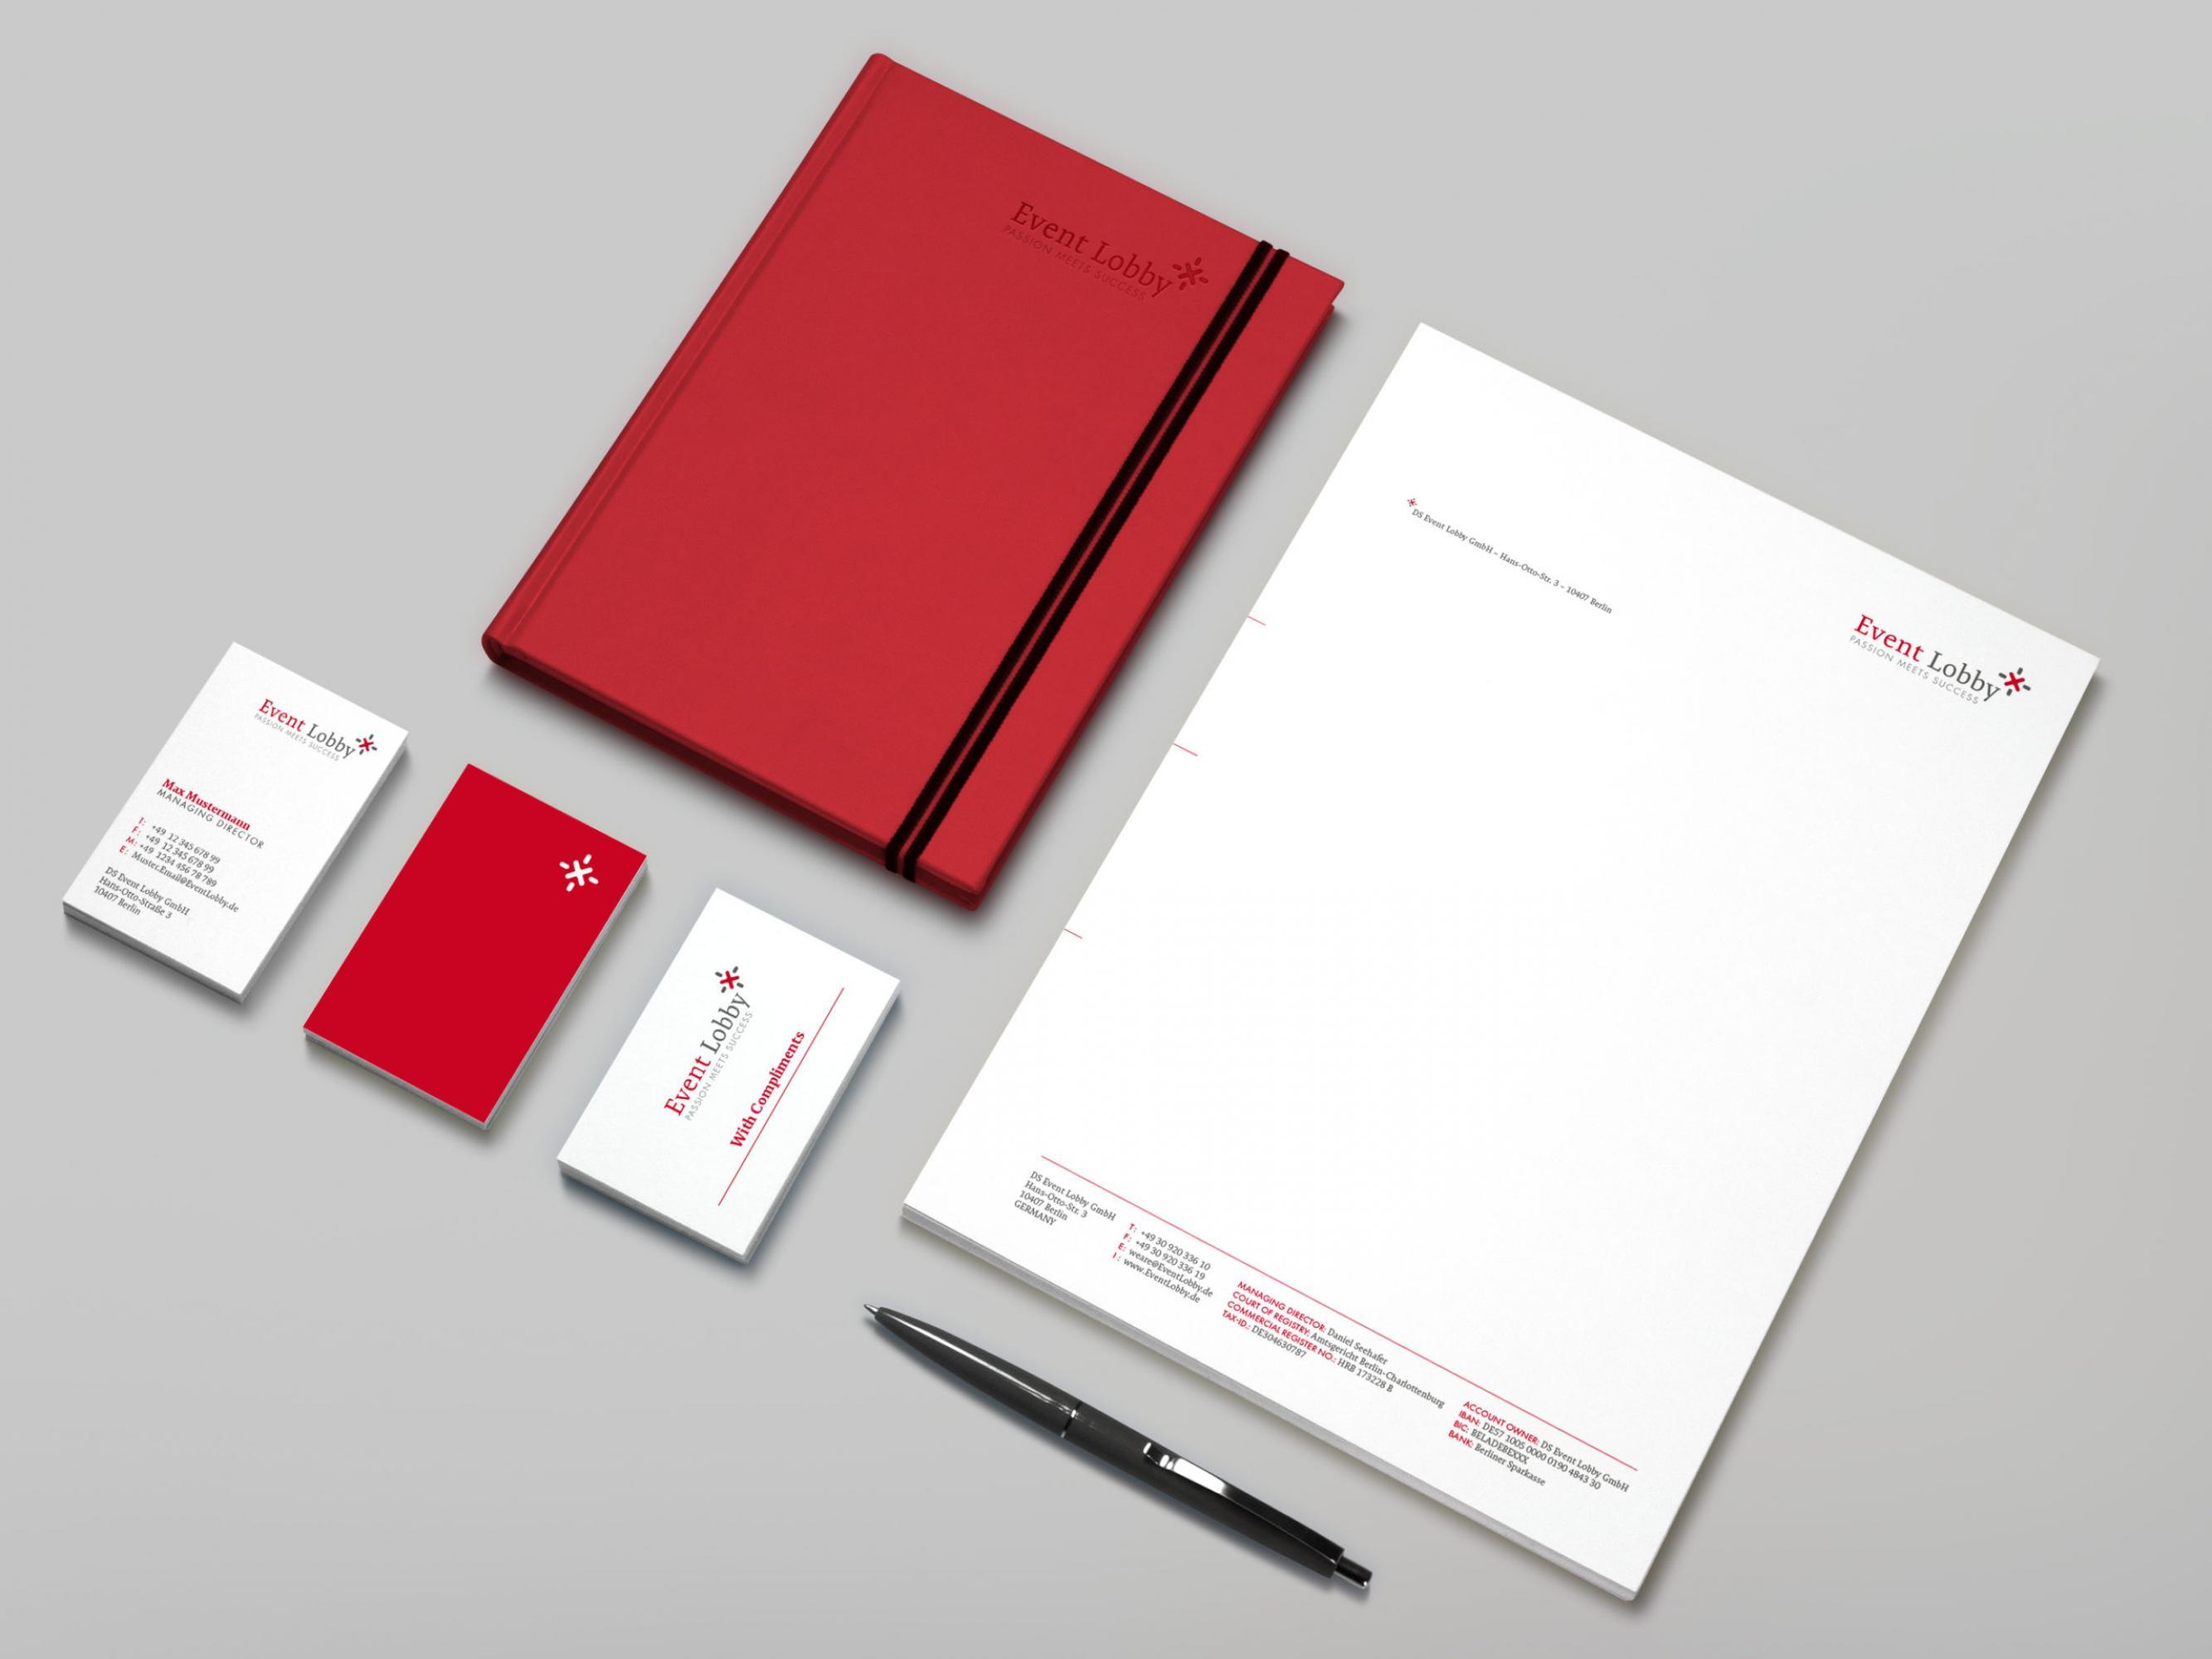 EventLobby-Branding-druckprodukte-geschaftsausstattung-01